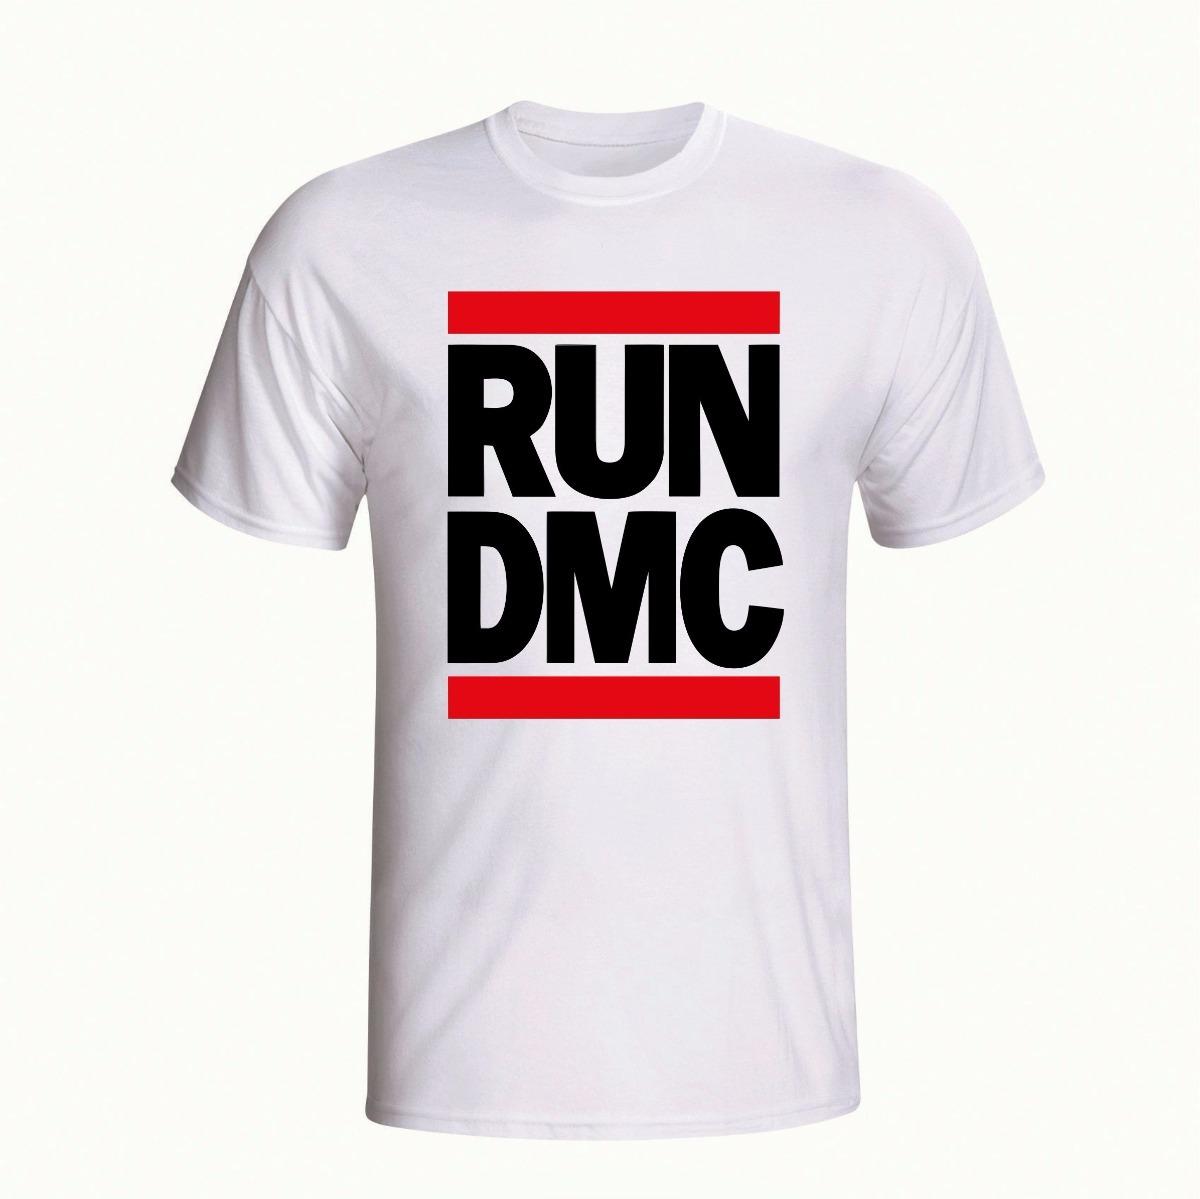 ded79b74b7af2 camiseta run dmc hip hop rap personalizada branca camisa. Carregando zoom.